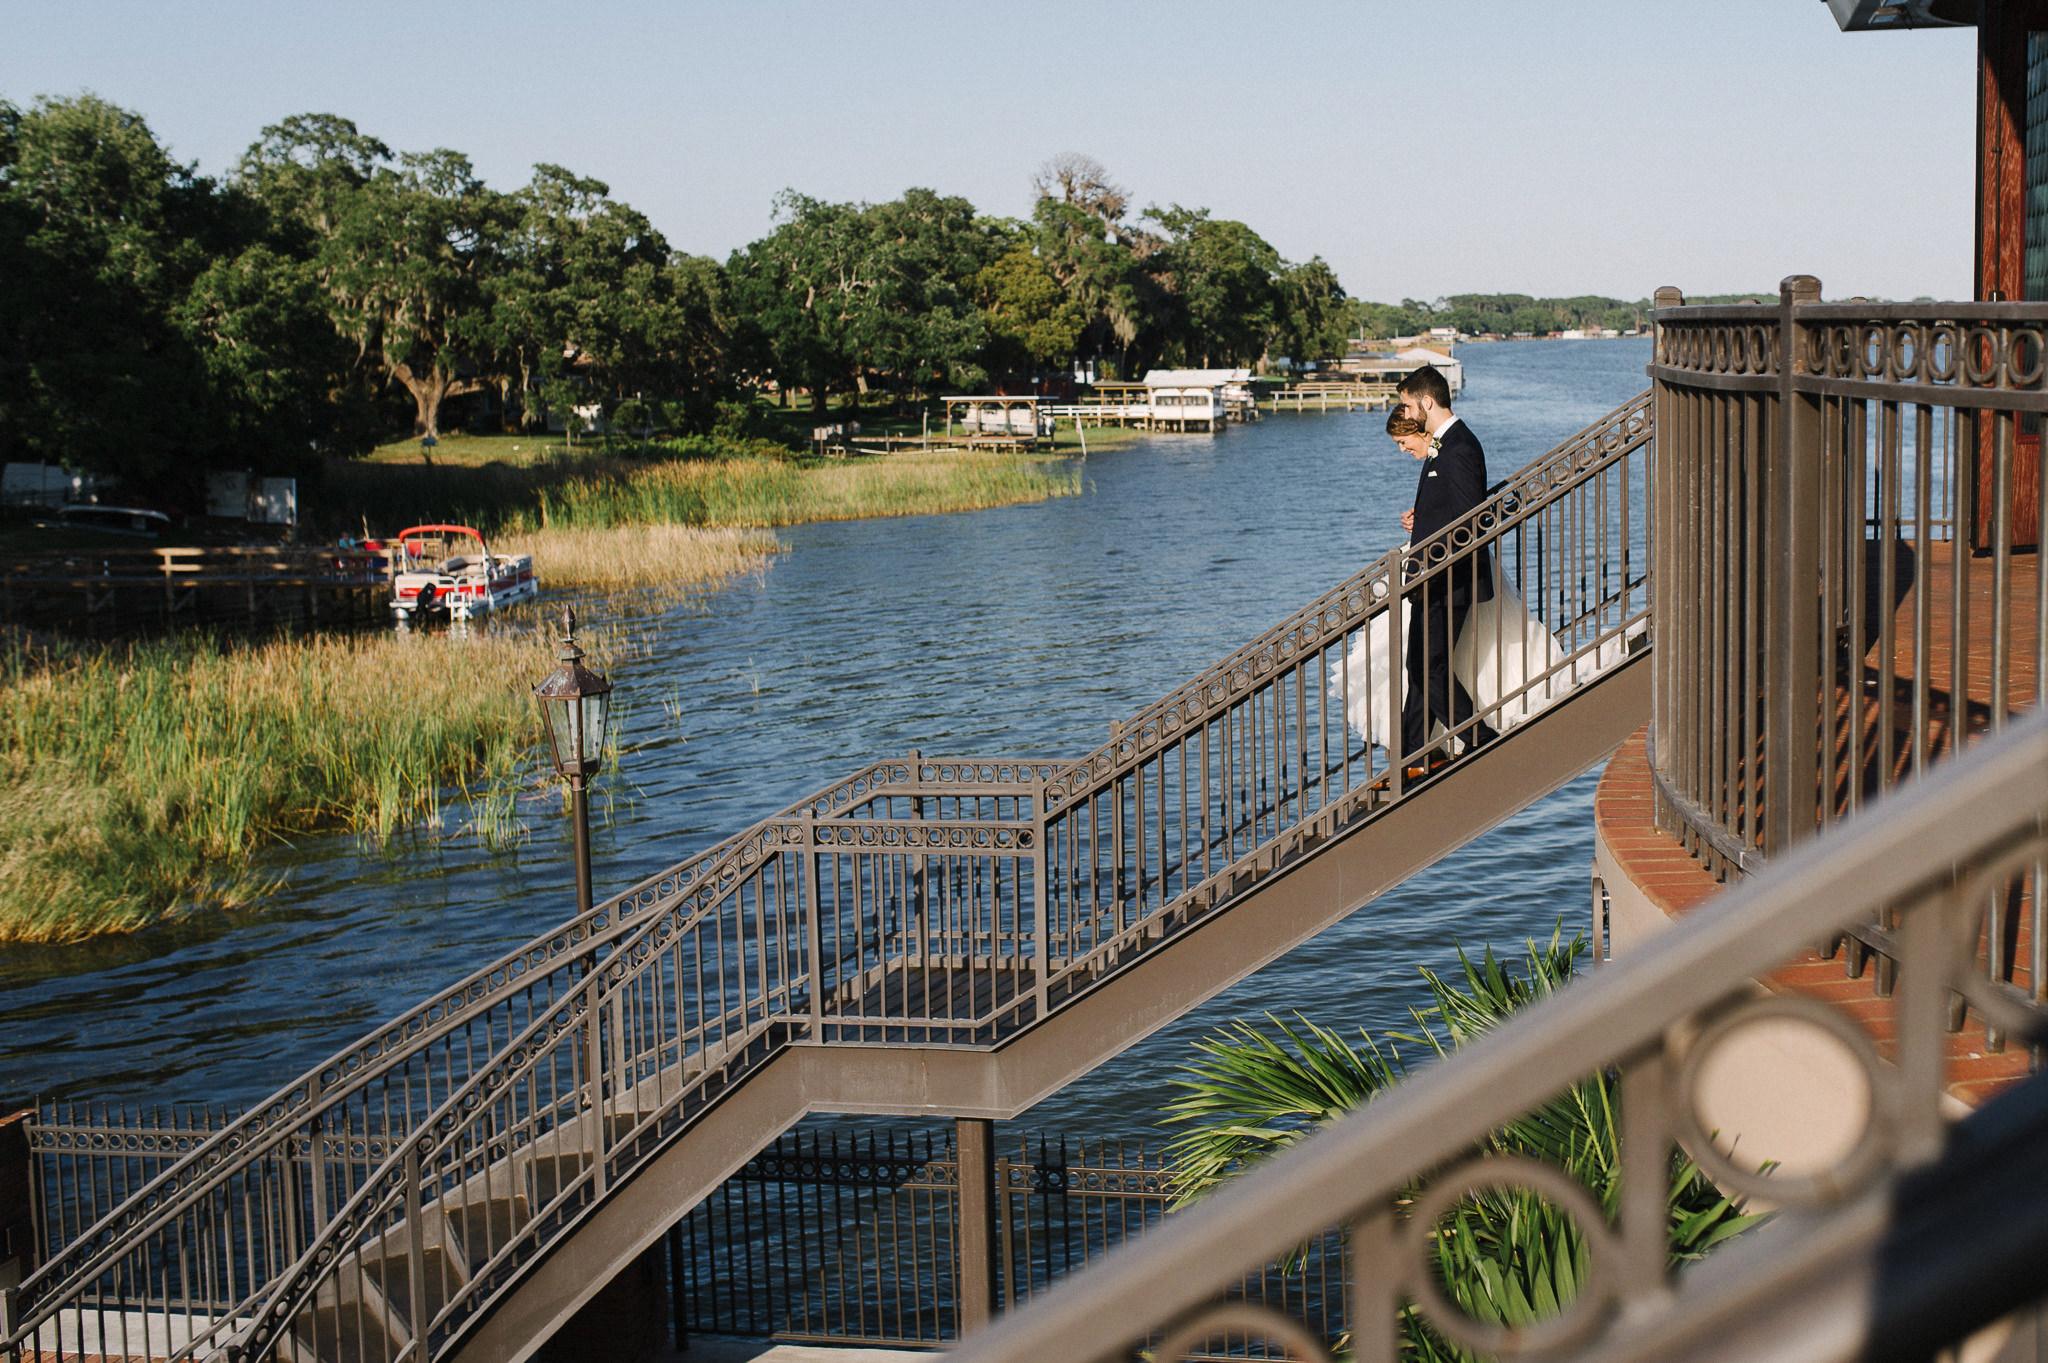 Tavares+Pavilion+on+the+Lake+Wedding+Florida_031.jpg